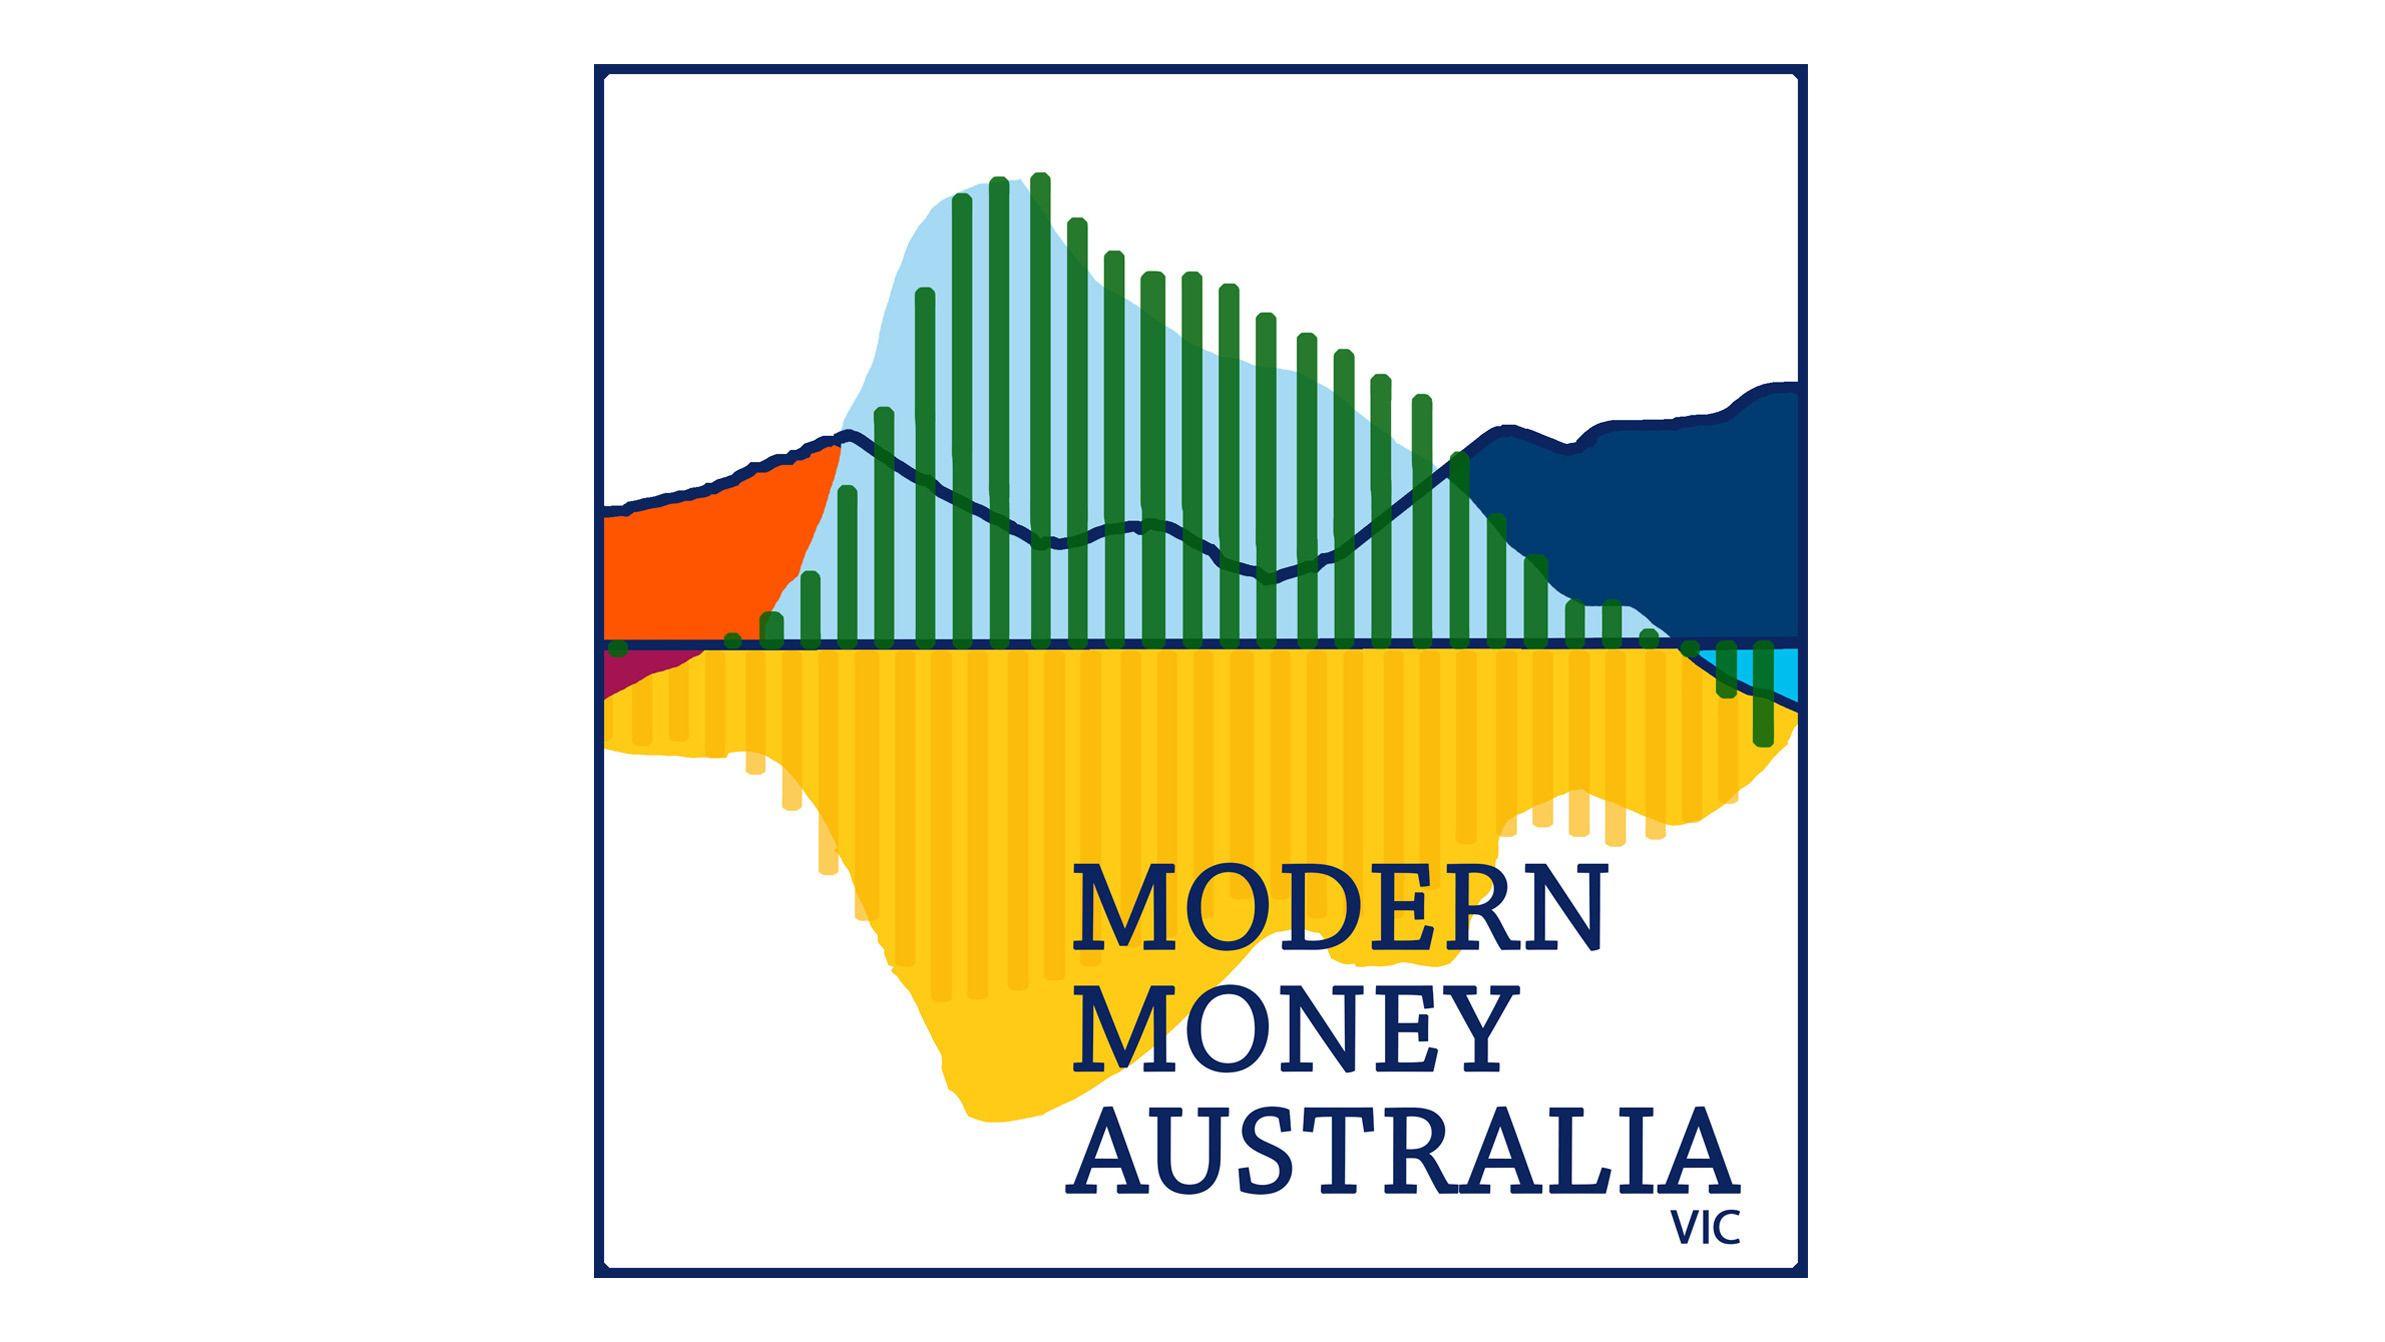 Modern Money Australia (VIC)